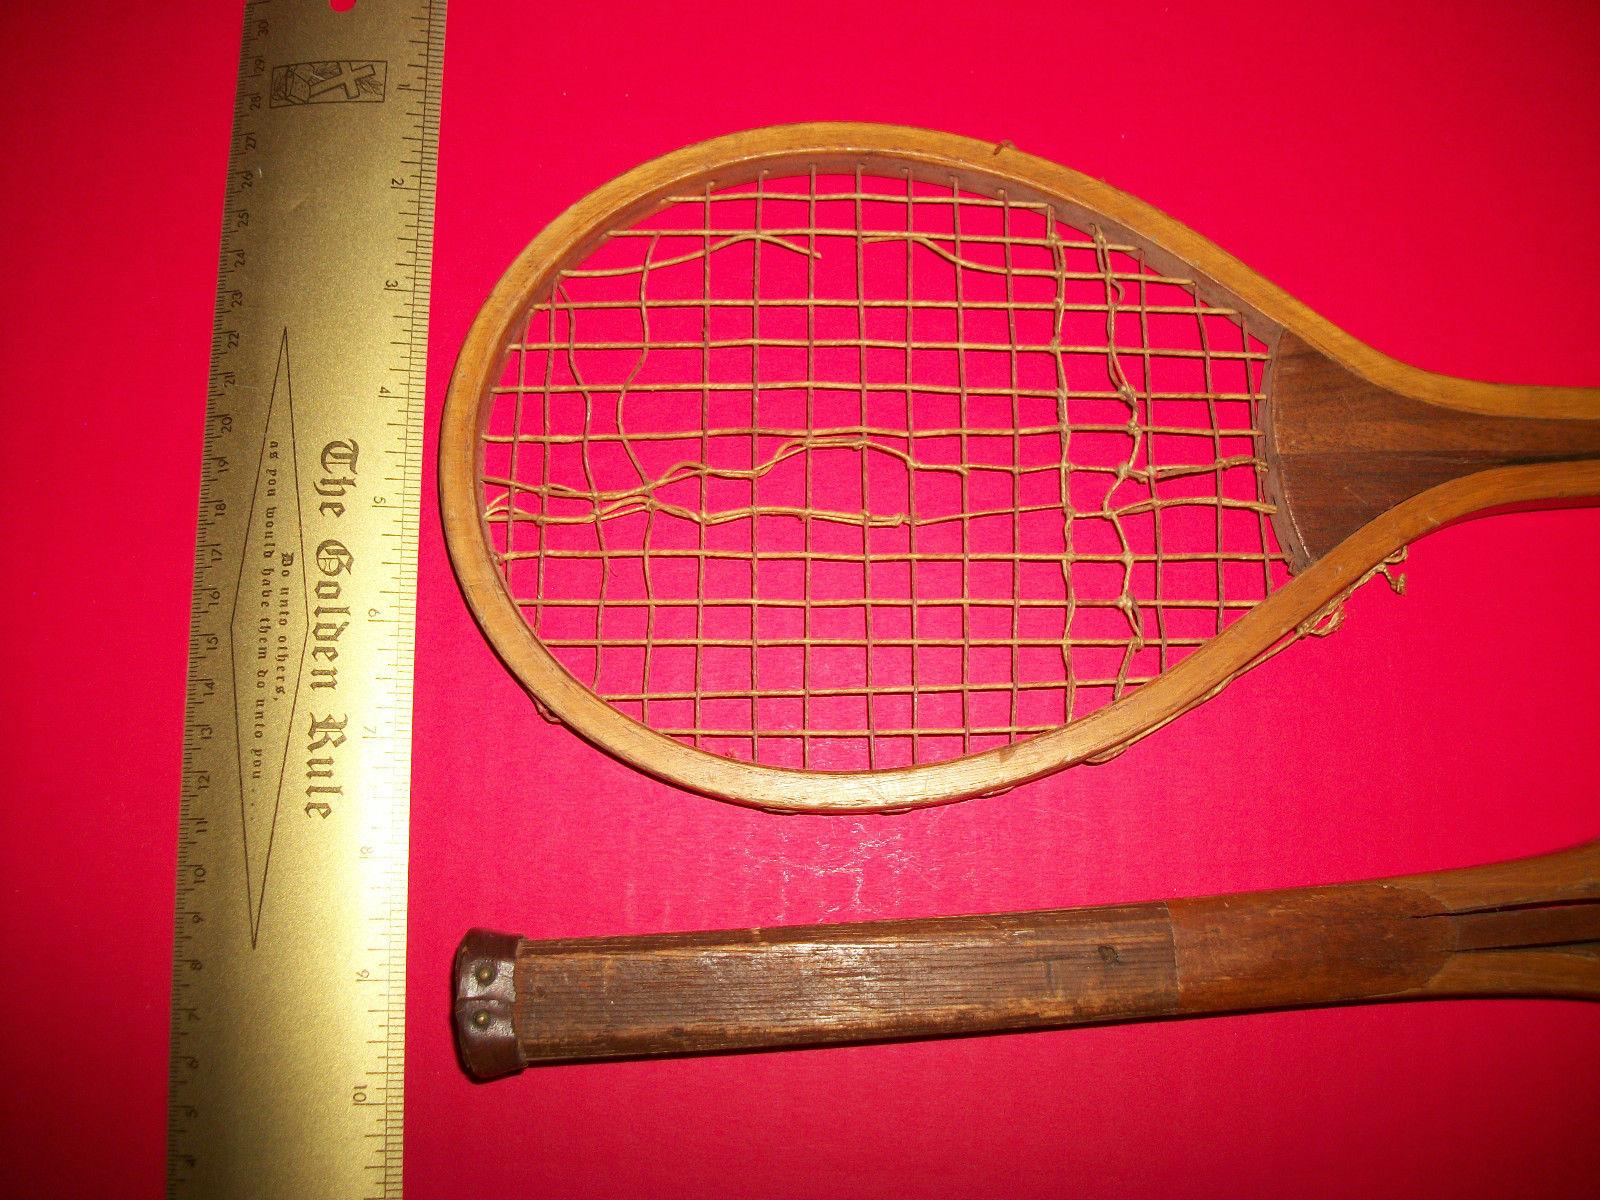 Sport Treasure Tennis Racquet Racket Sporting Good Pair Old Wood Equipment Decor image 7